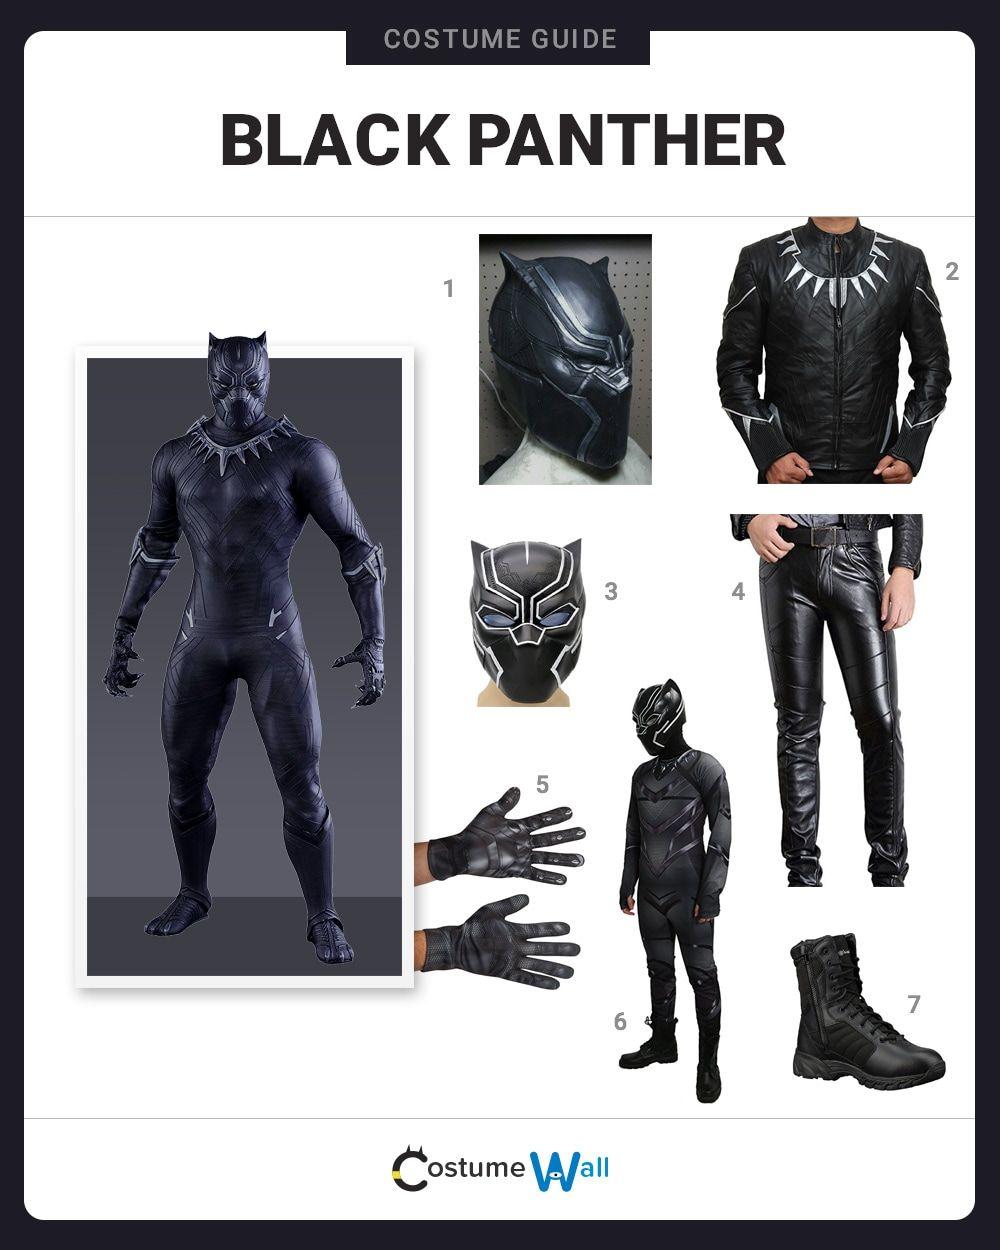 Dress Like Black Panther Black Panther Marvel Costume Black Panther Halloween Costume Black Panther Costume